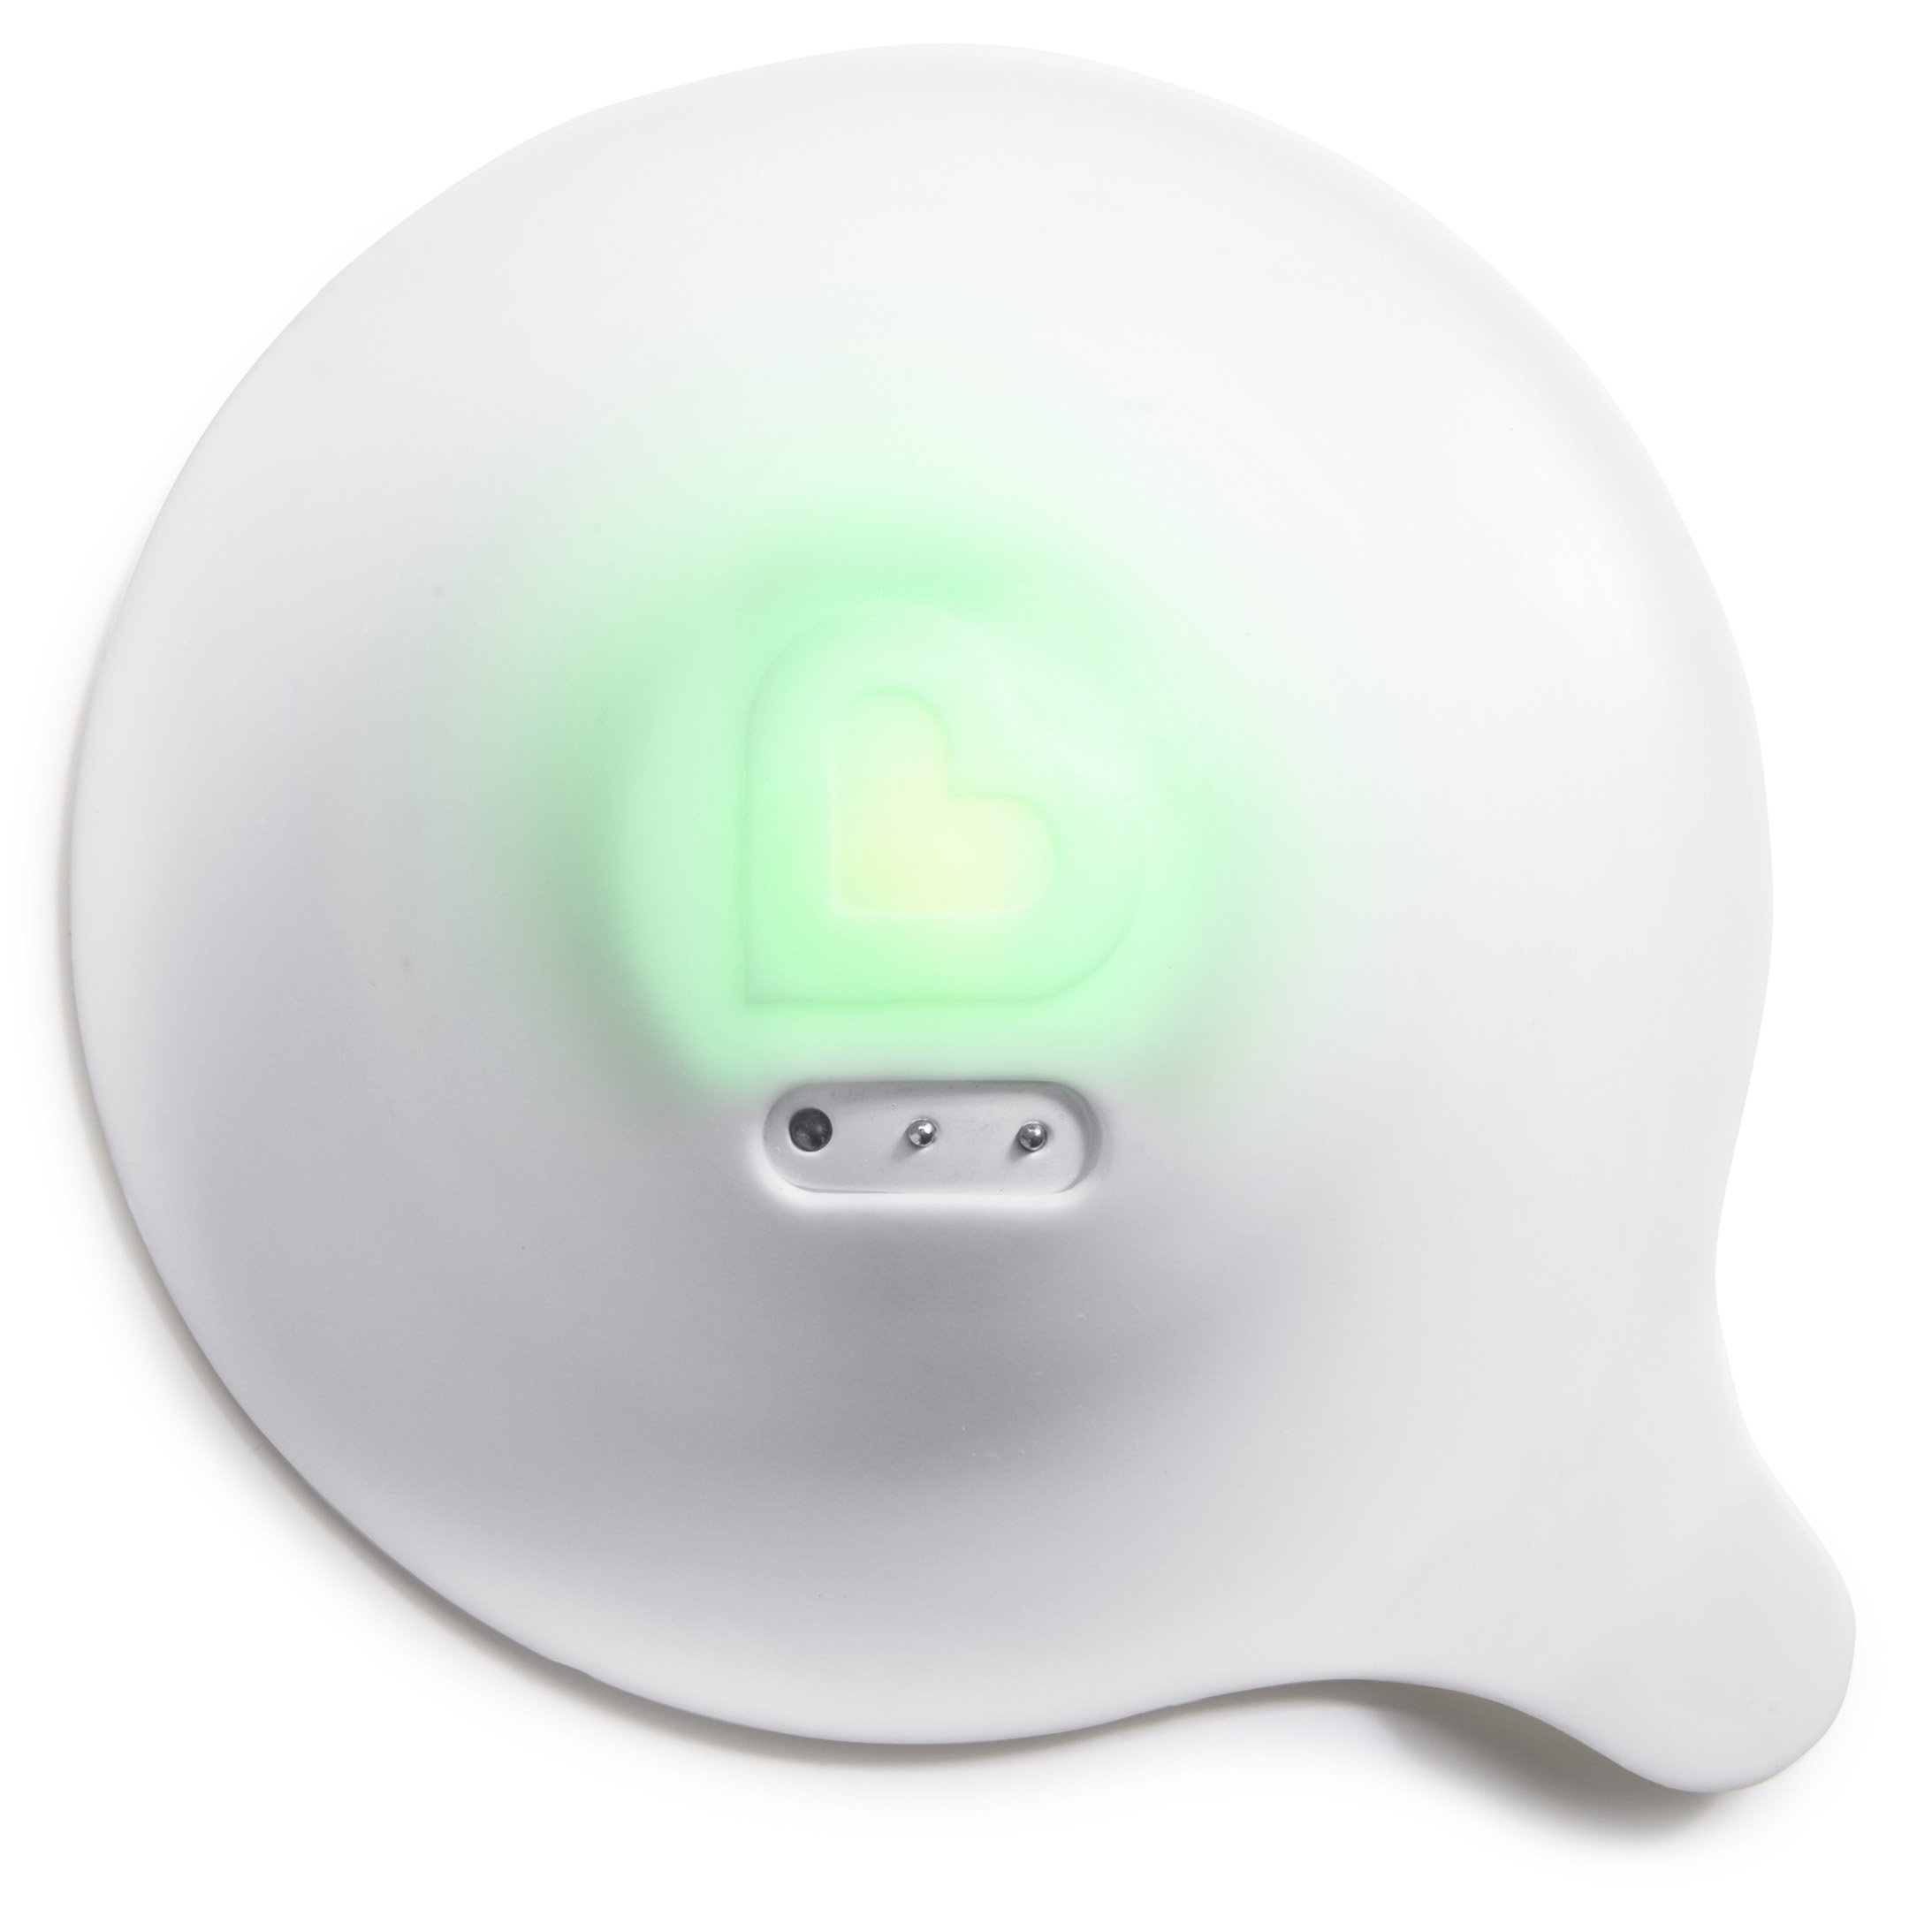 Munchkin Smartdrain Temperature Sensing Drain Cover, White